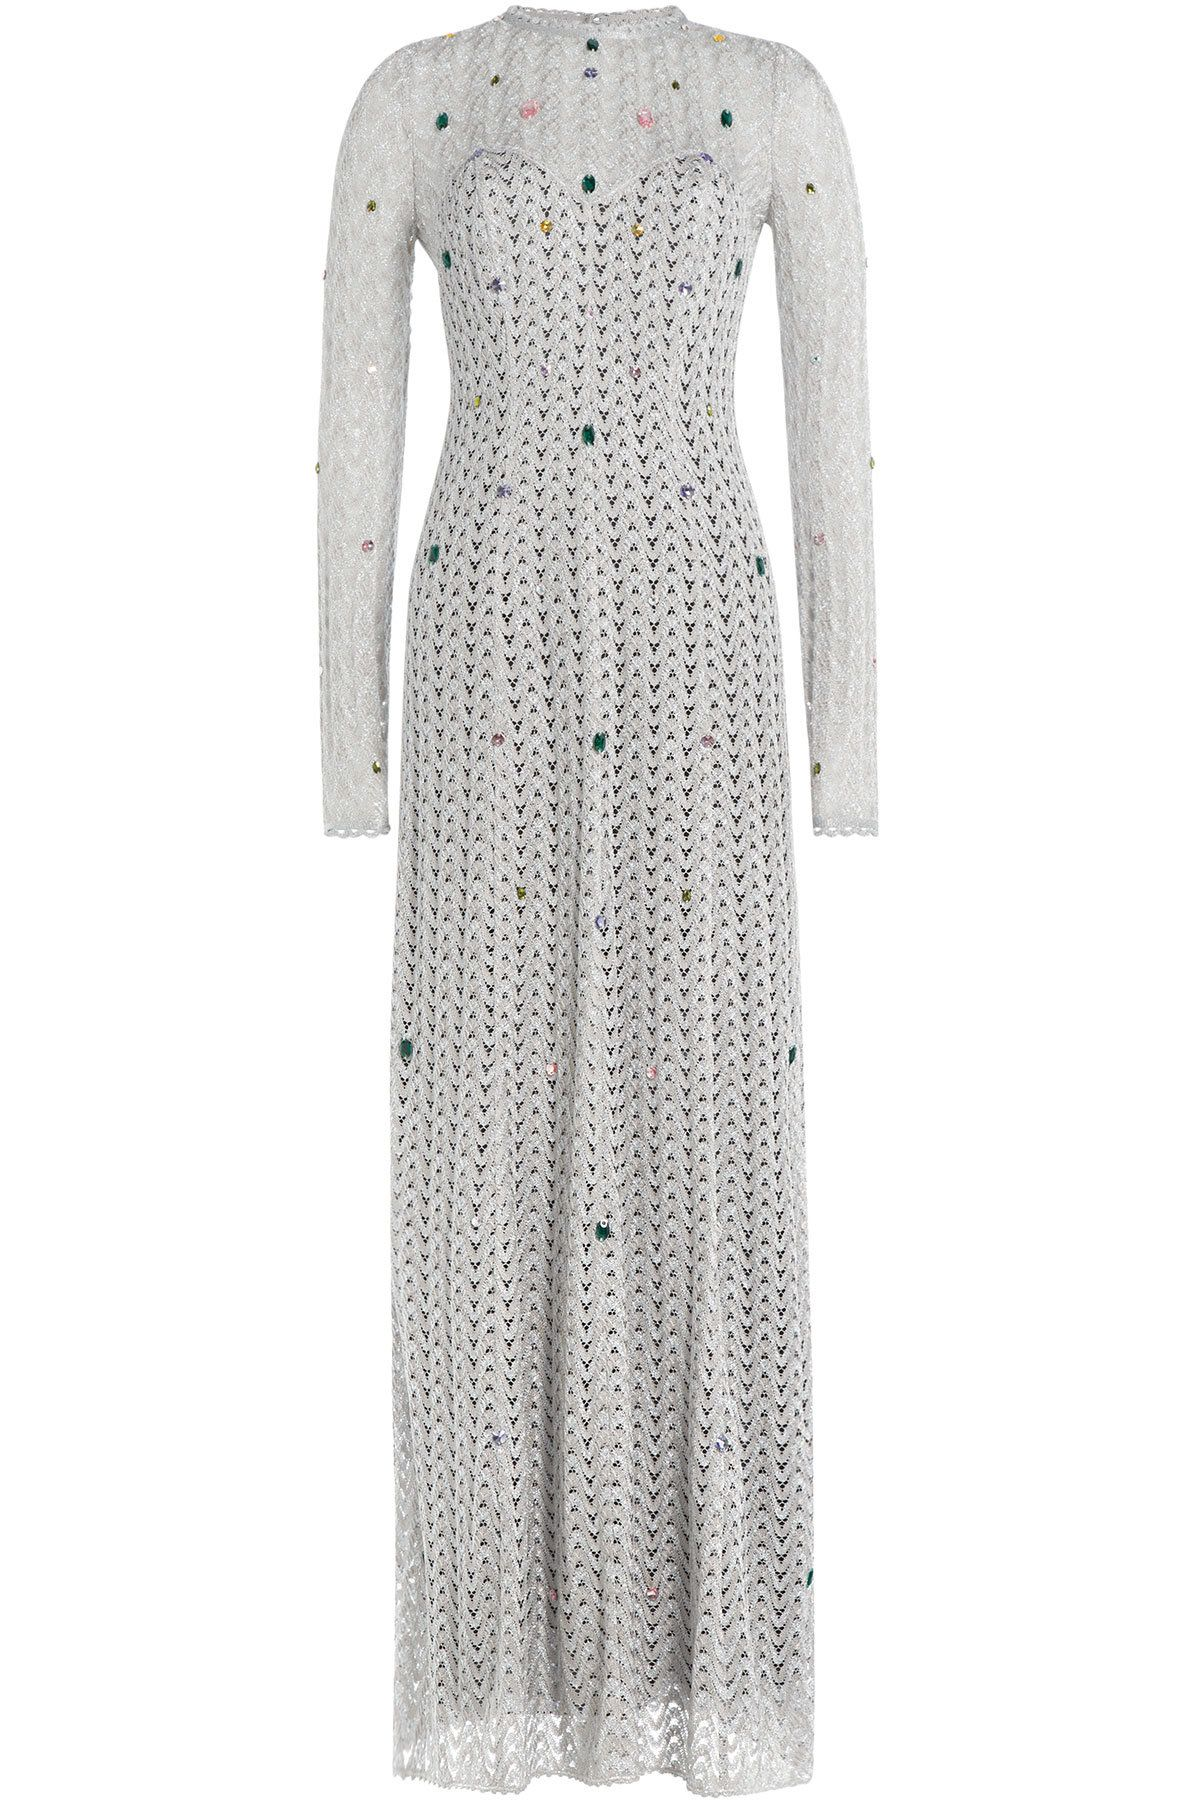 Missoni - Embellished Floor Length Crochet Knit Gown | Women\'s ...